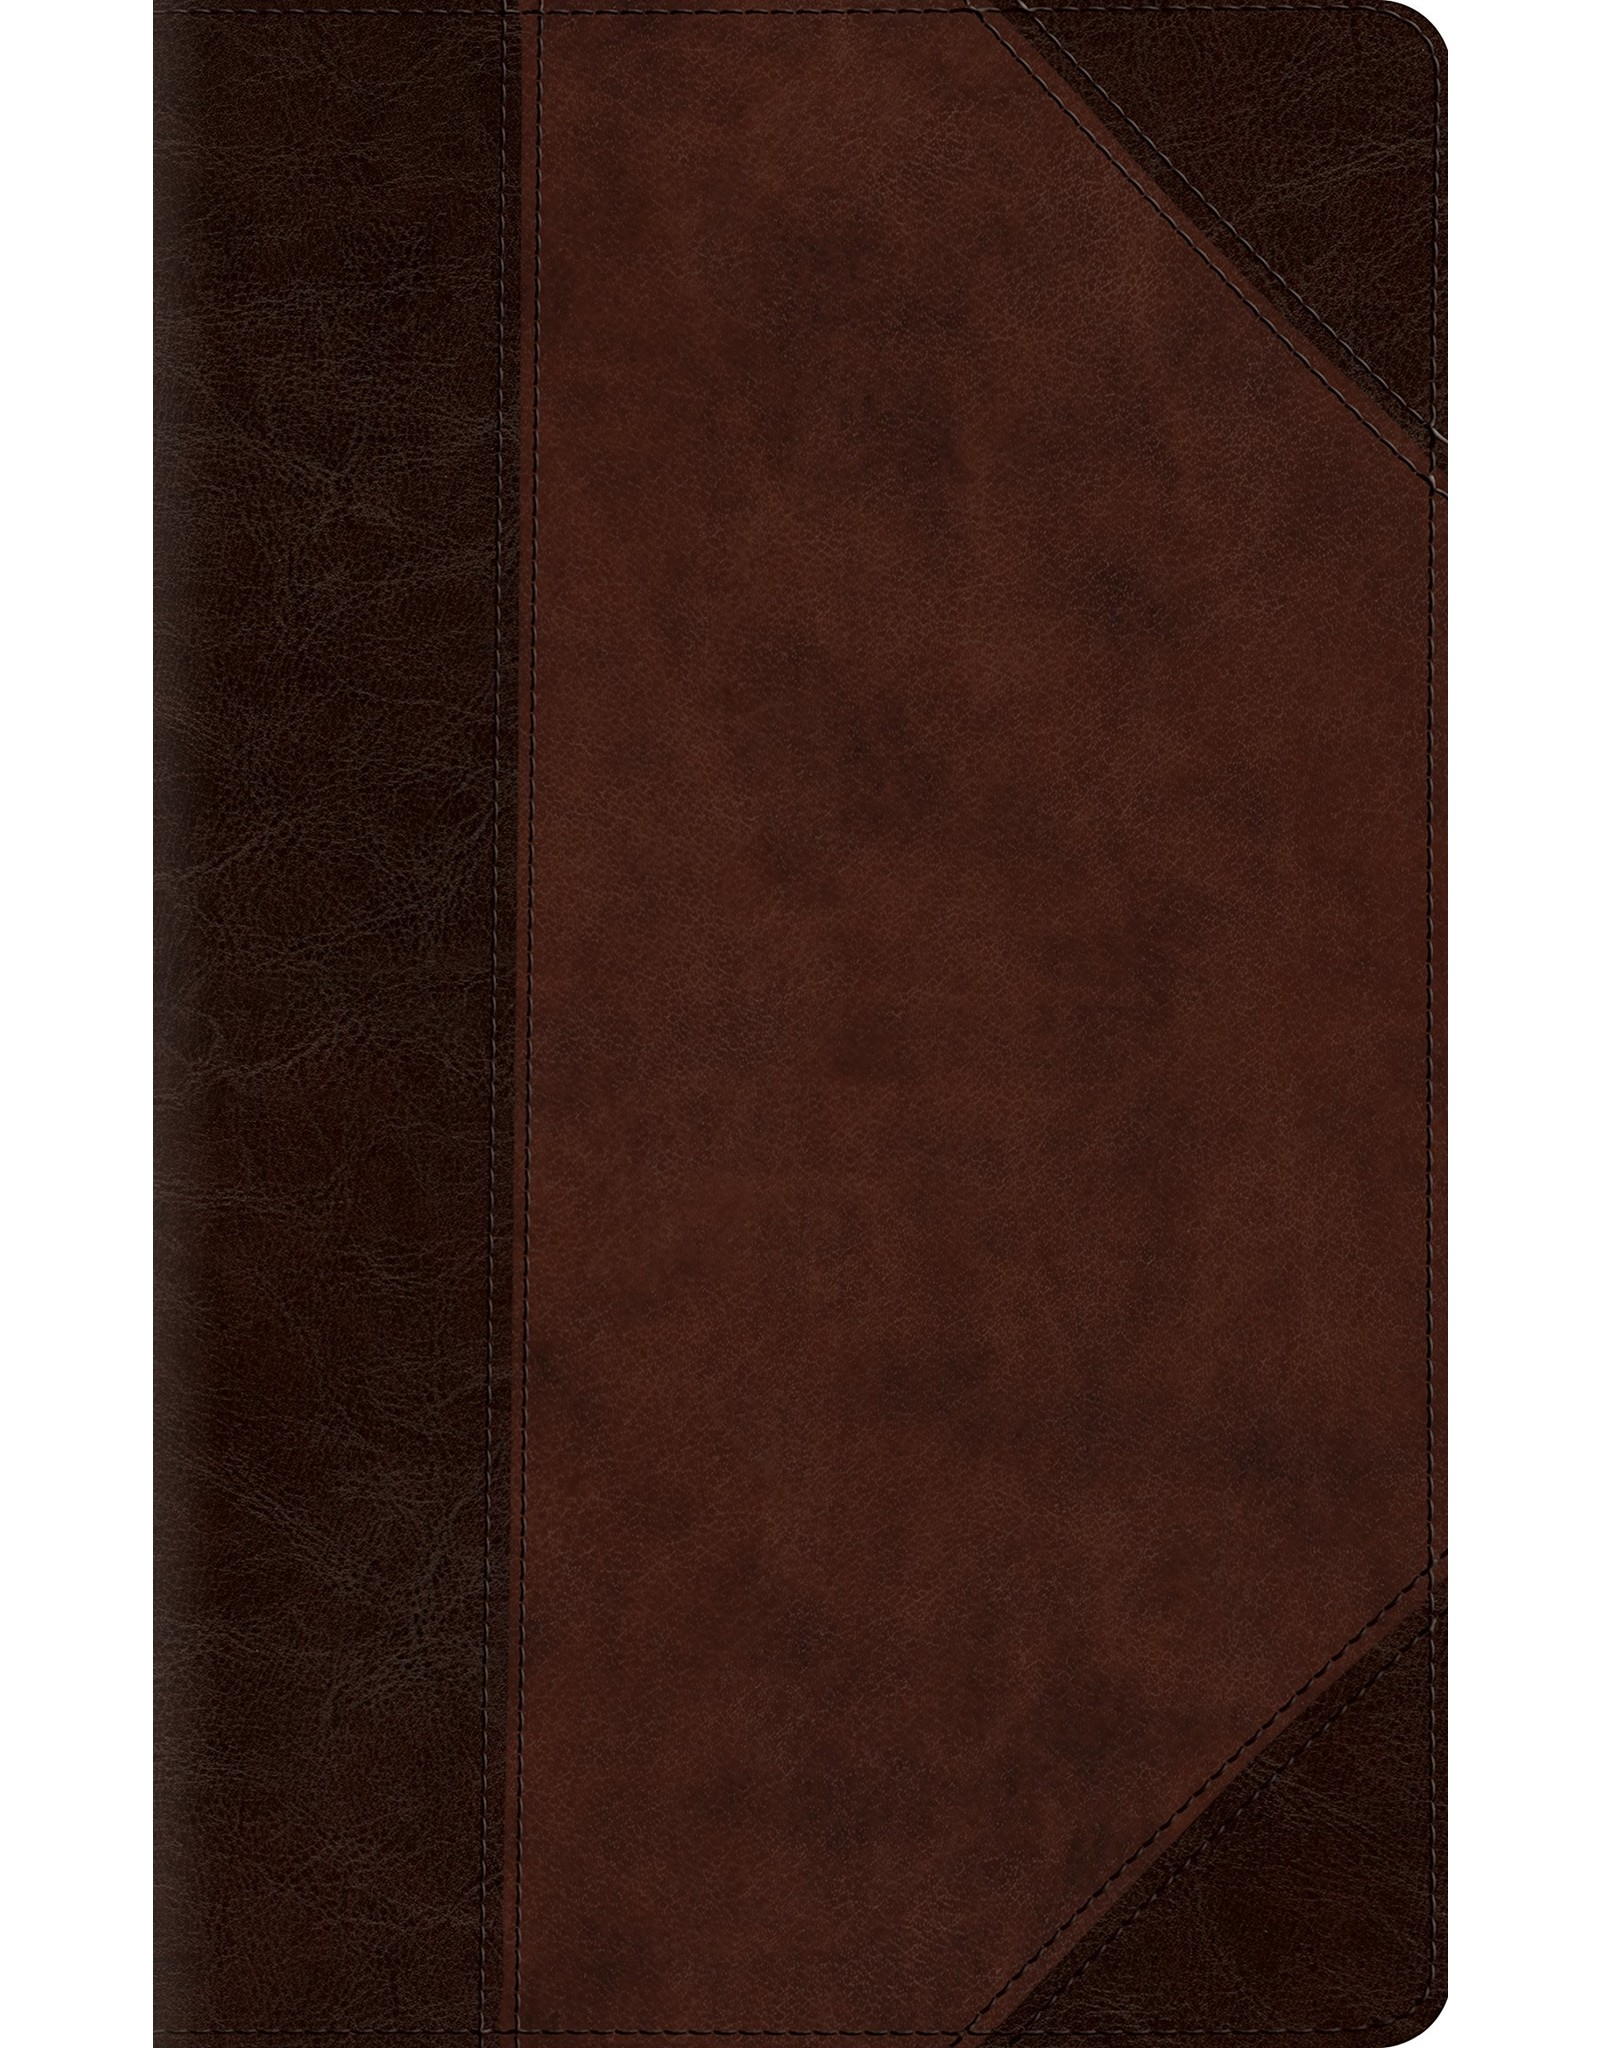 Crossway / Good News ESV Large Print Compact Bible (TruTone, Brown/Walnut, Portfolio Design)